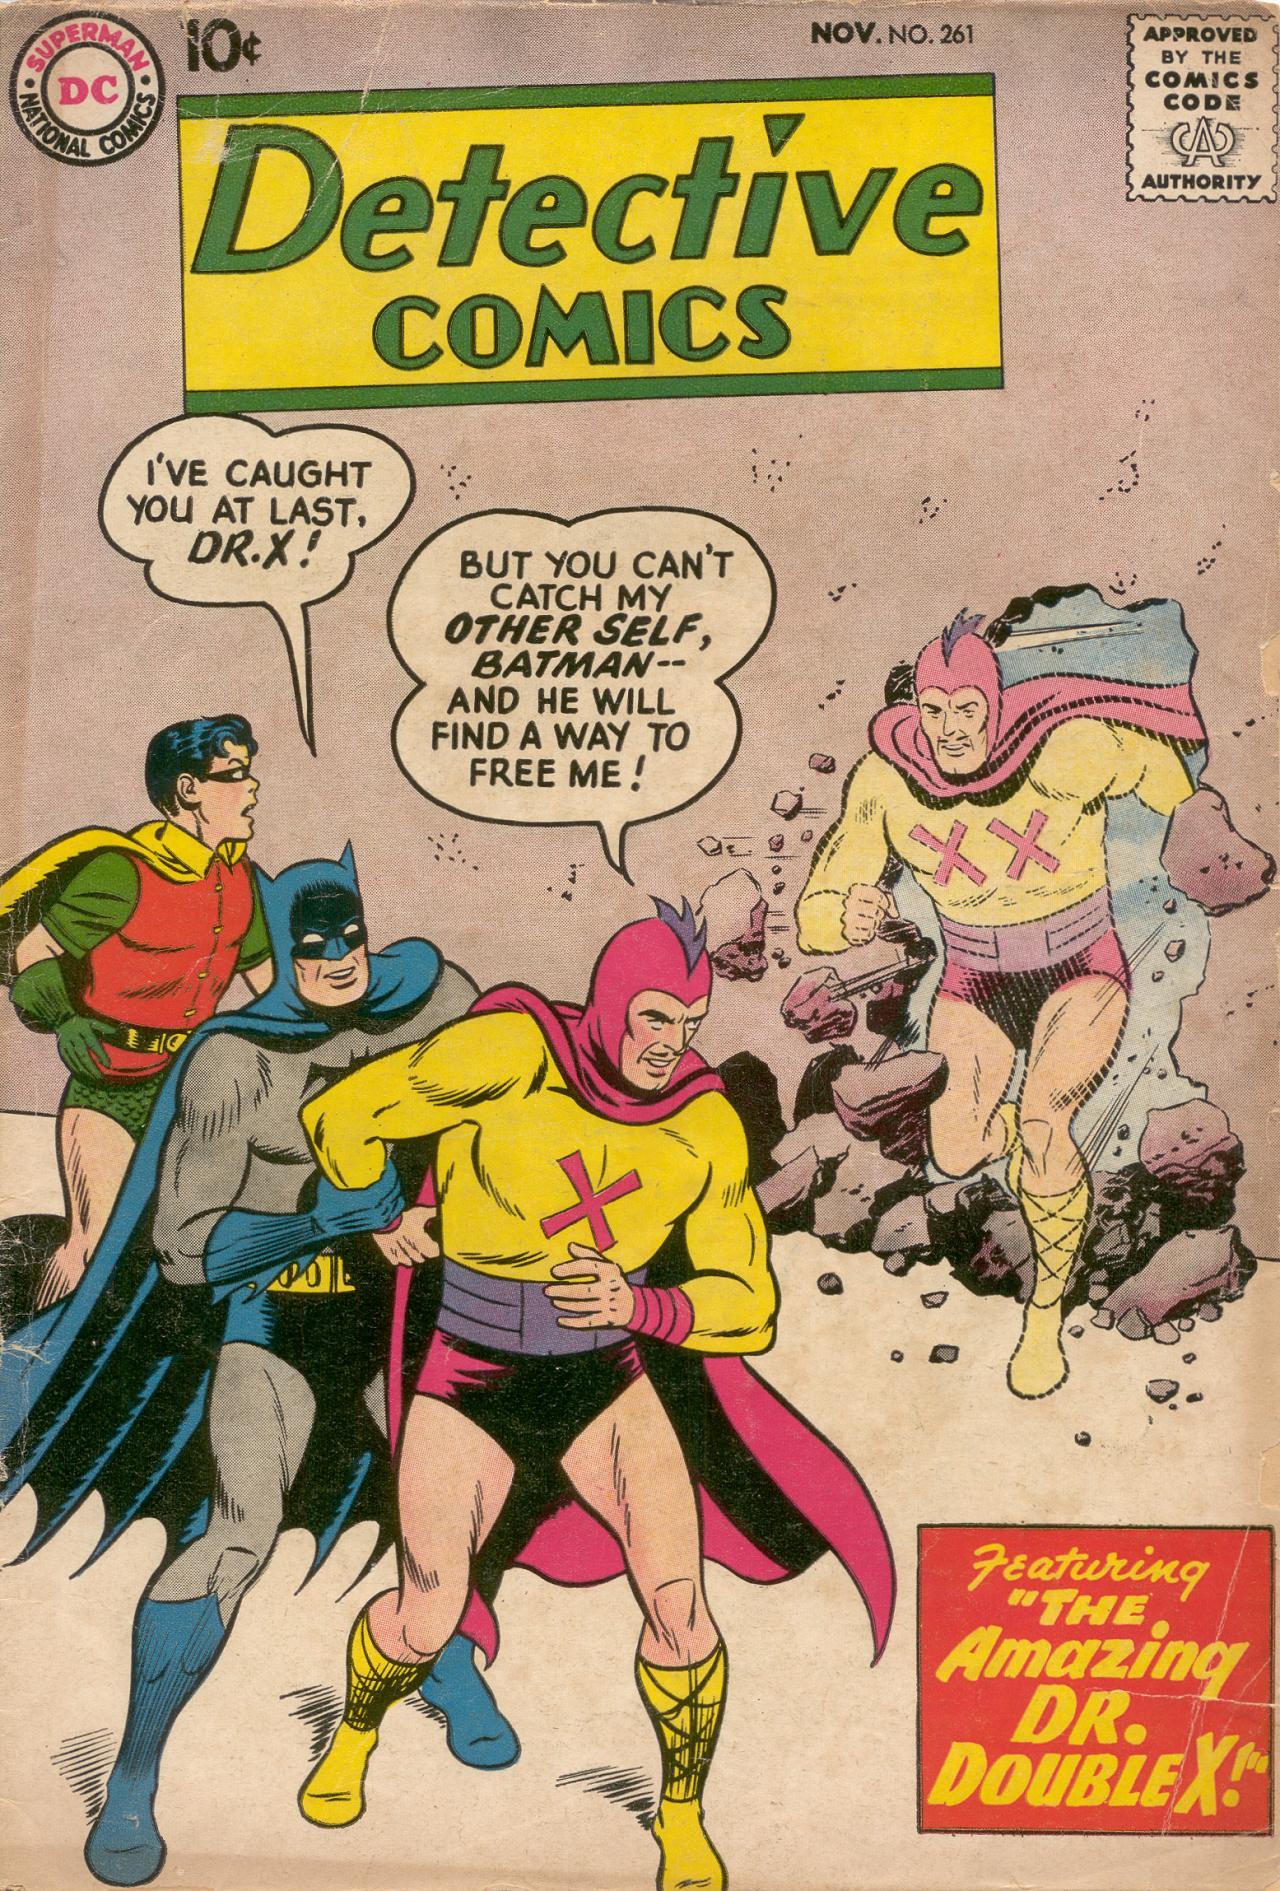 Detective Comics (1937) 261 Page 1